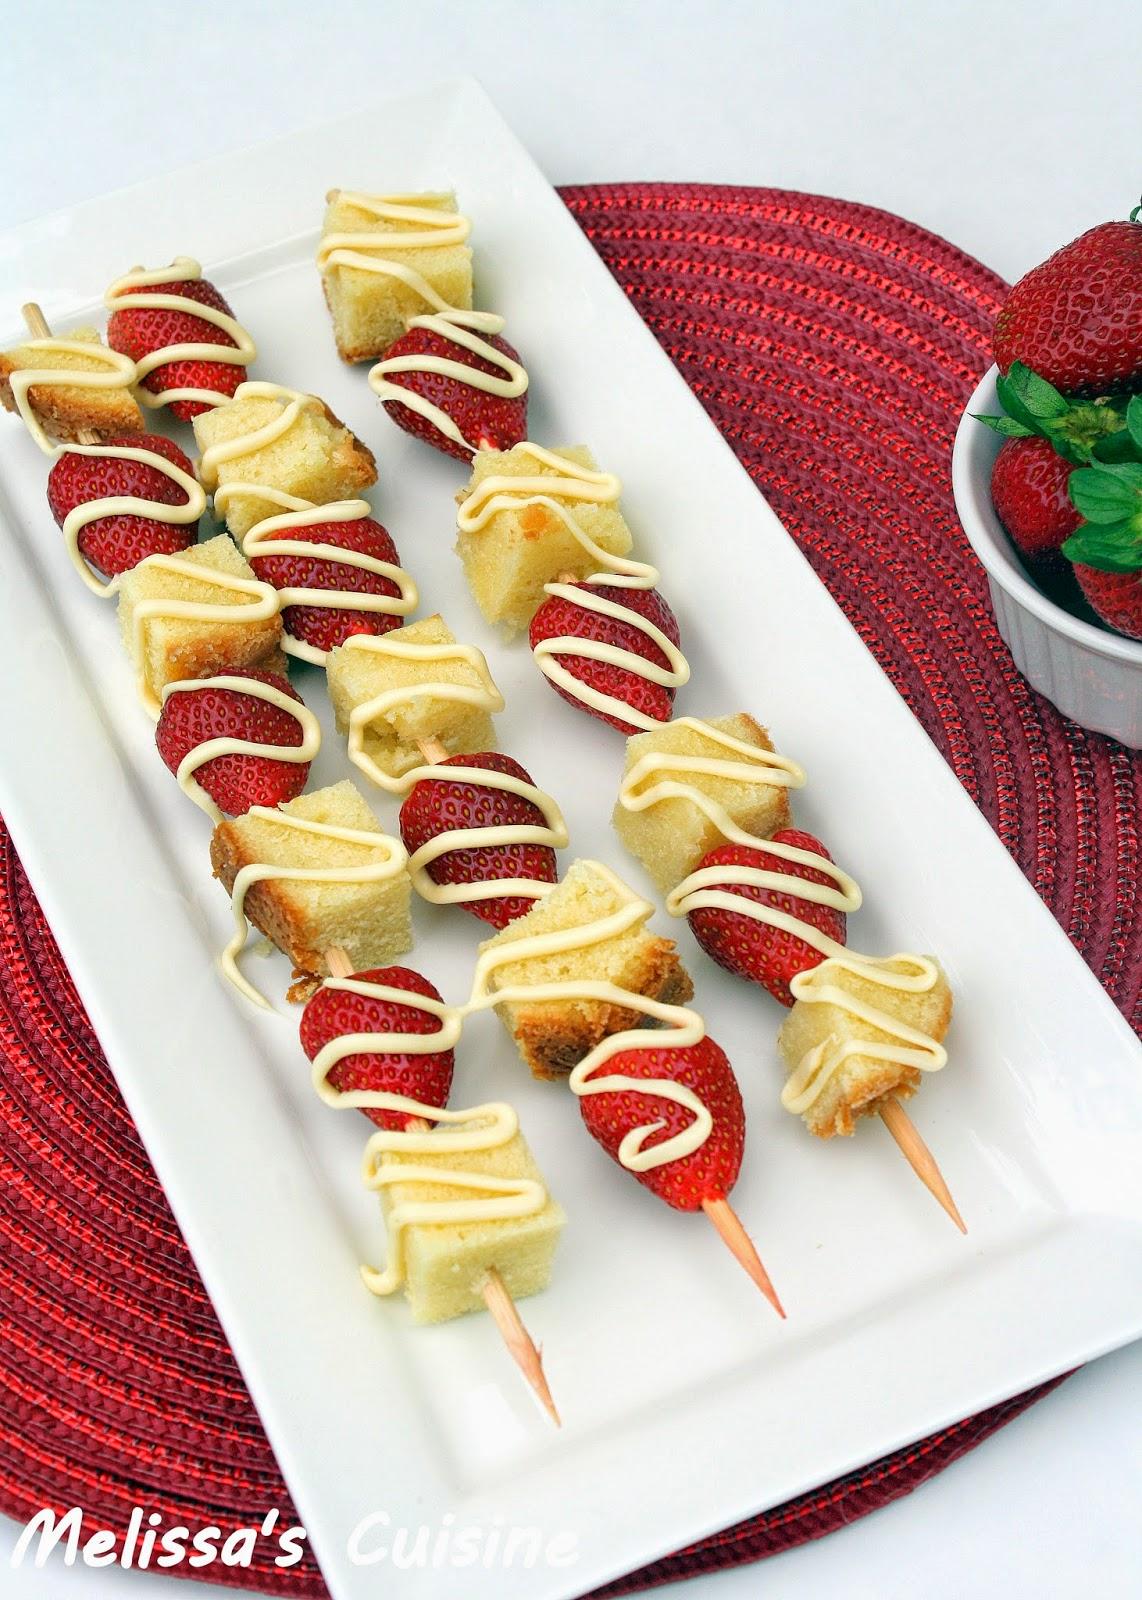 Melissa's Cuisine: White Chocolate Strawberry Pound Cake Skewers